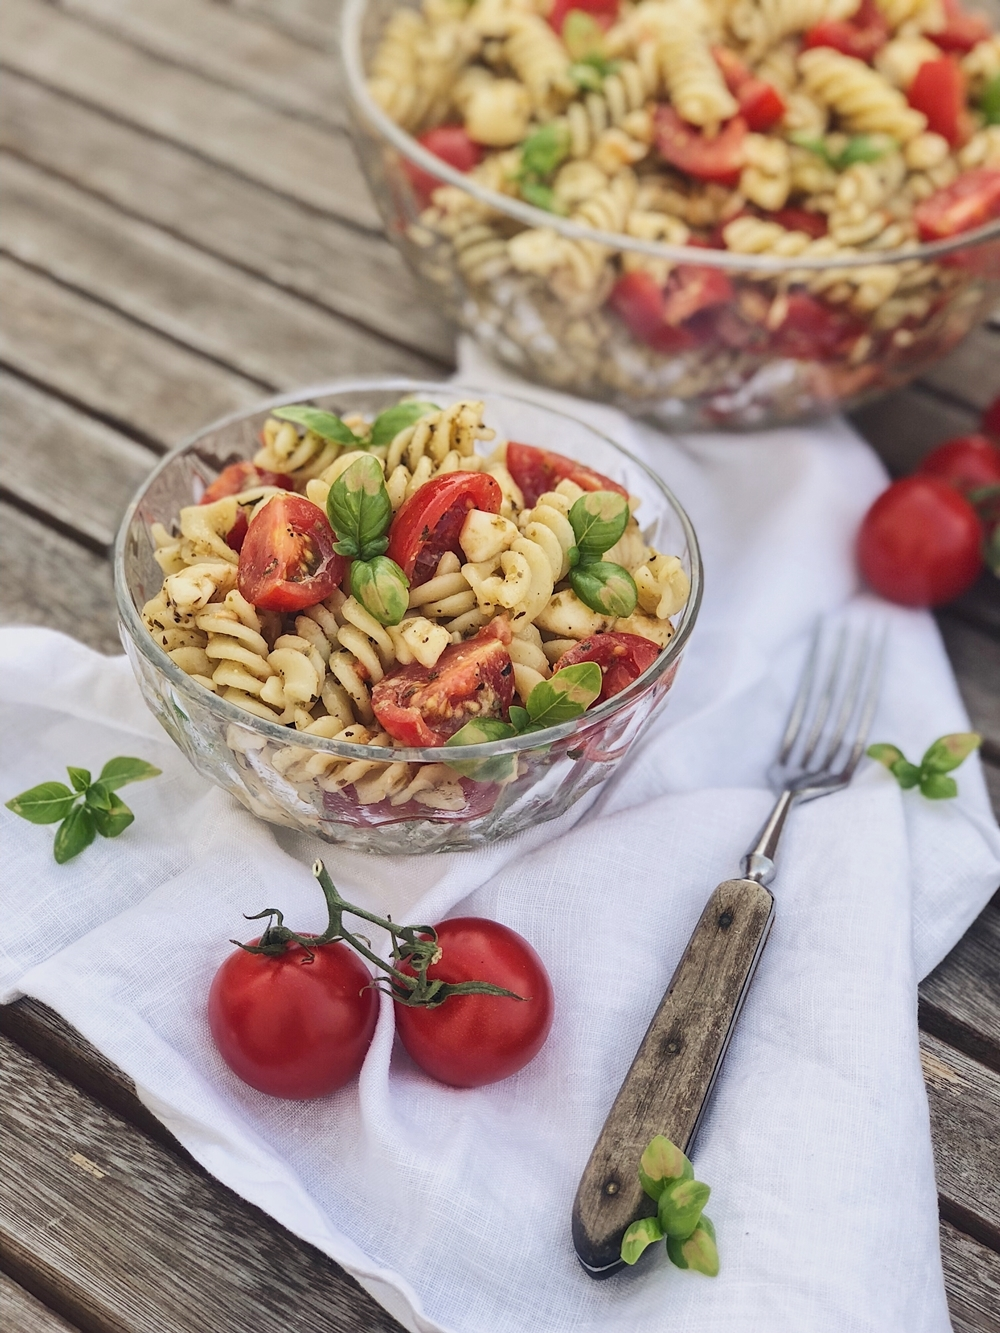 italienischer Pesto-Nudelsalat mit Tomaten und Mozzarella